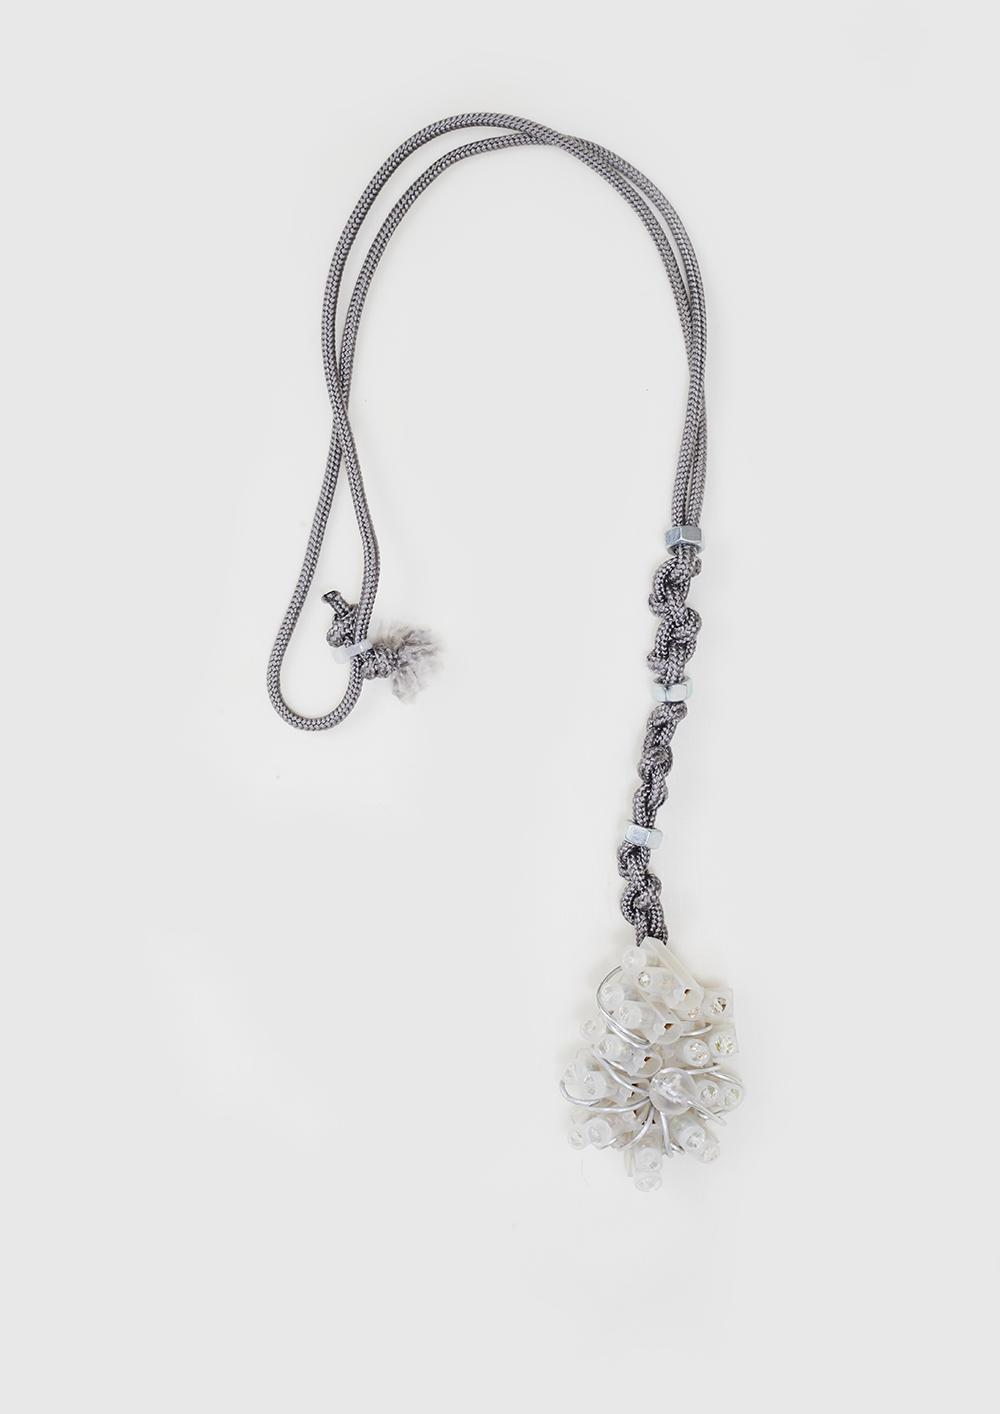 Blackoutlabel necklaces purity 567